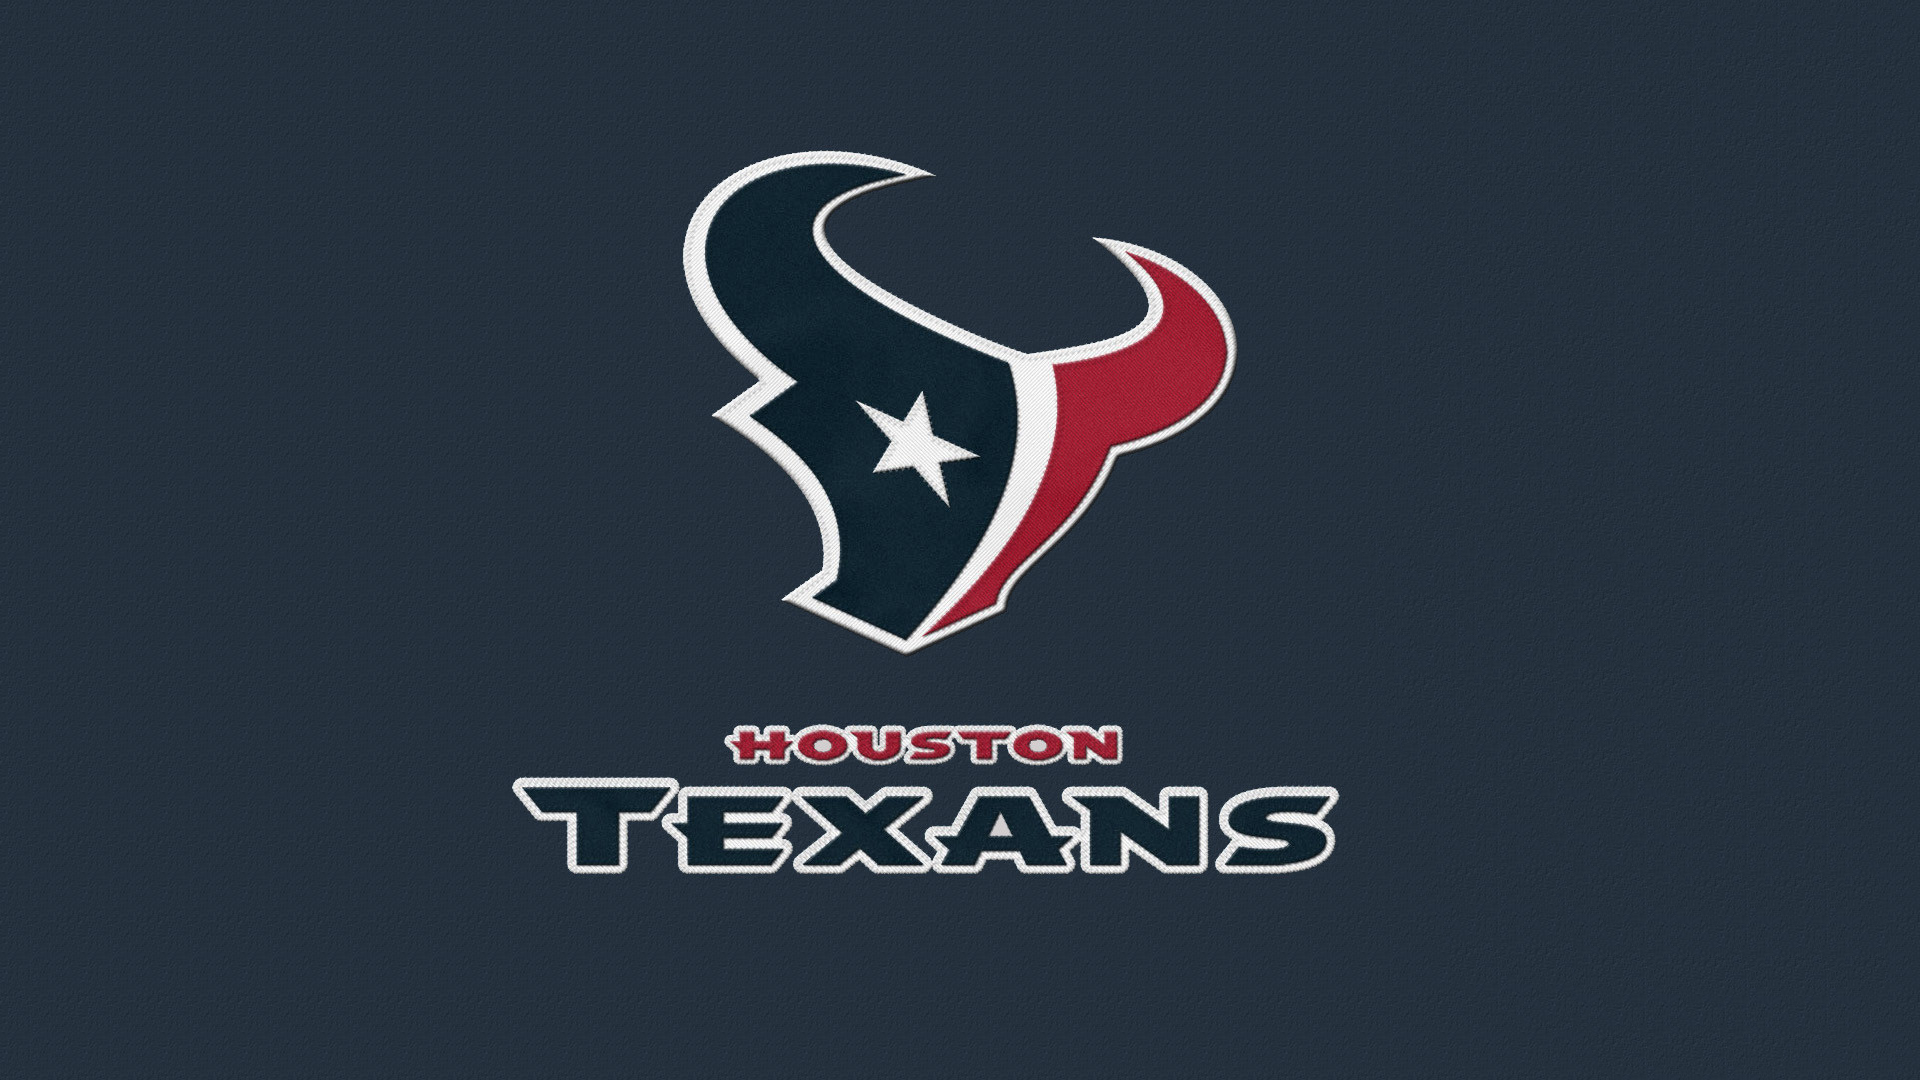 Texans Computer Backgrounds